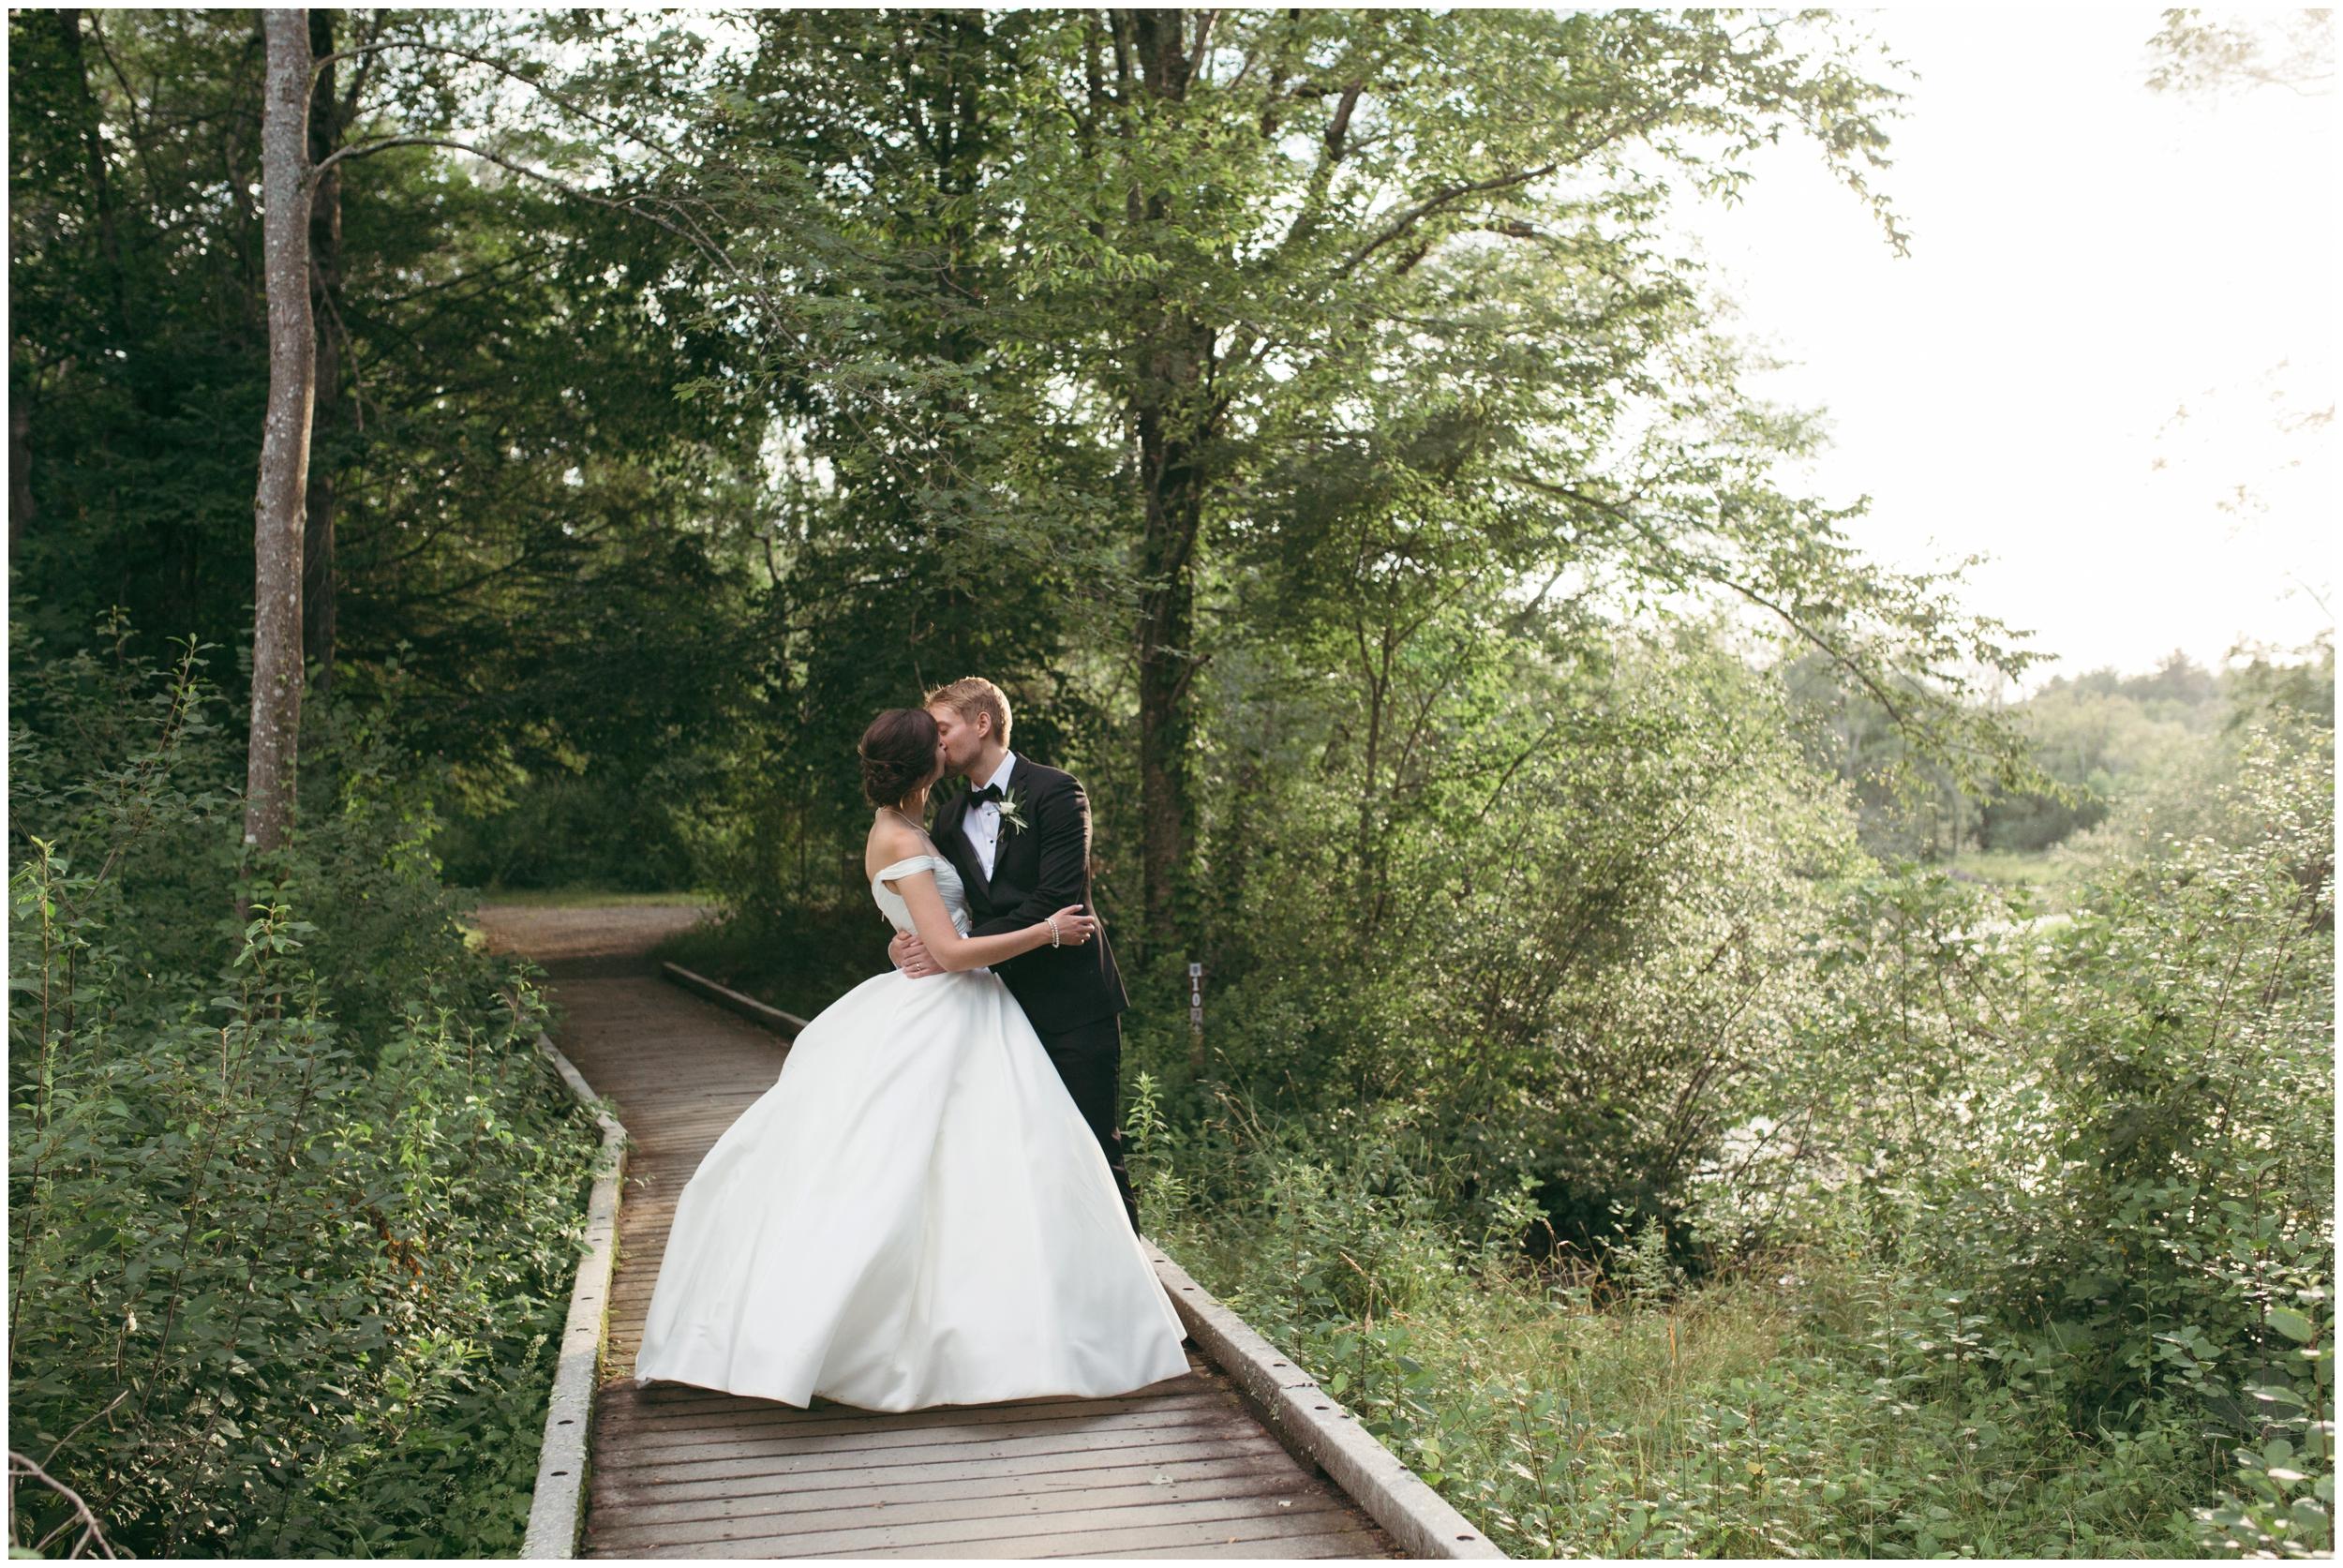 Willowdale-Estate-Wedding-Bailey-Q-Photo-Boston-Wedding-Photographer-065.JPG